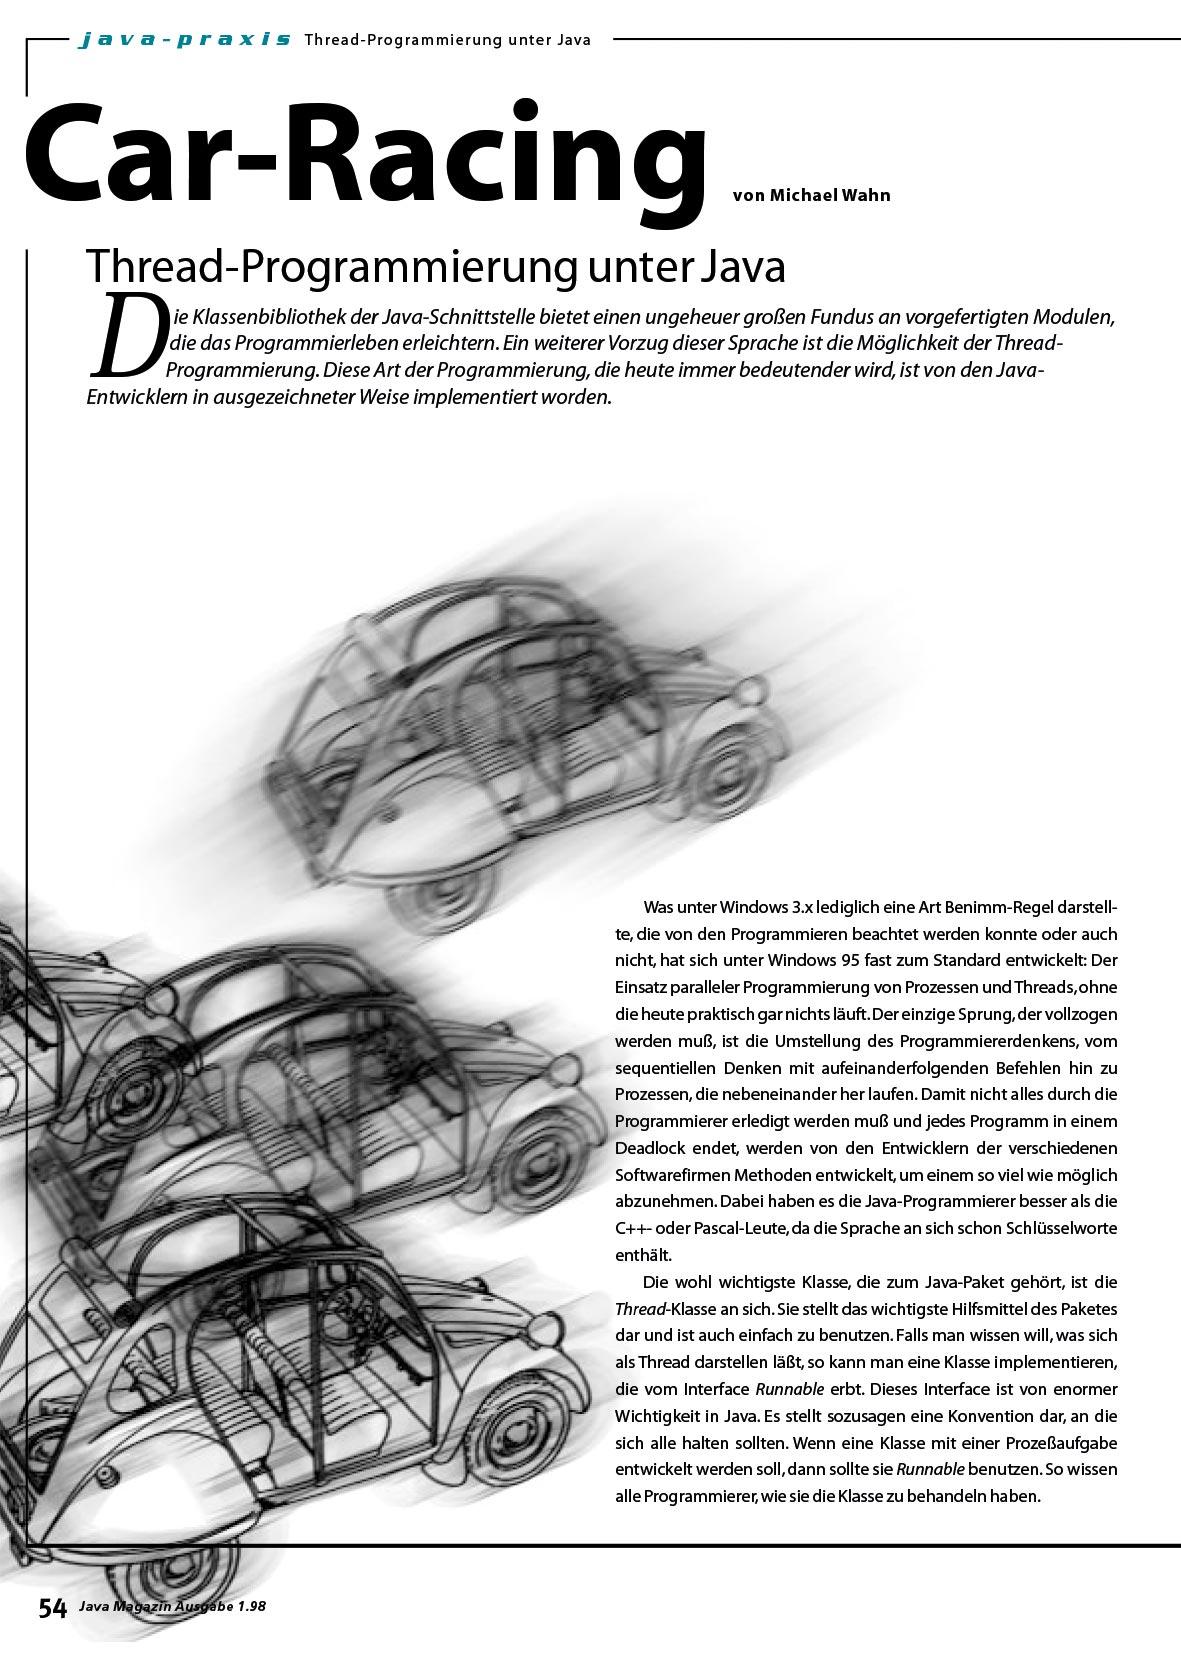 jm_1_1998-50.tif_fmt1.jpg